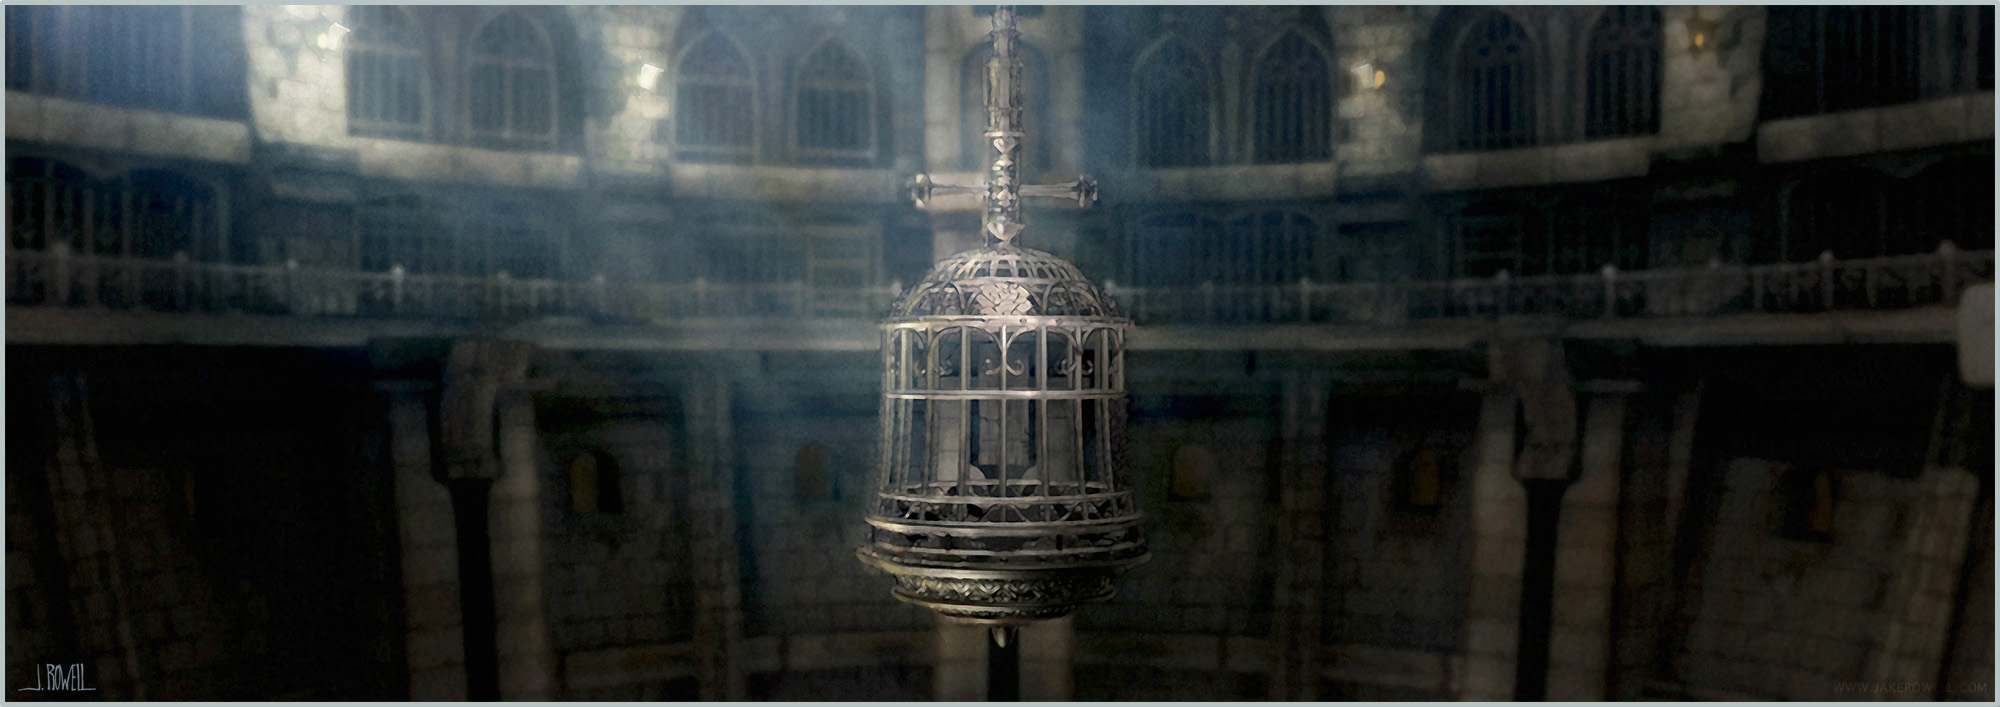 Alexandria-Castle-Prison-Cell-FFIX.JPG